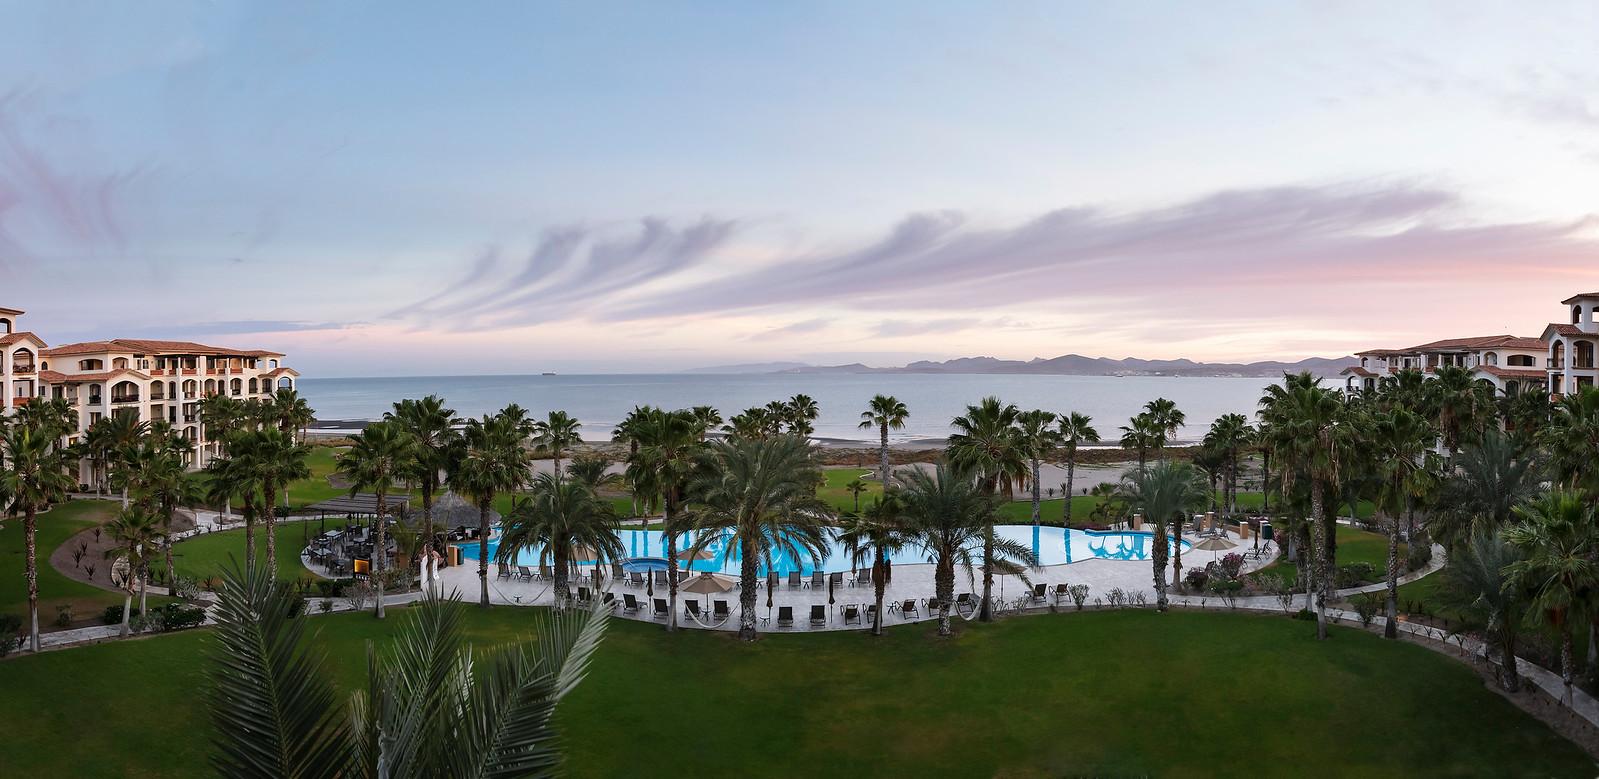 LaPaz-Paraiso_Resort-PoolShot-Sunrise-Panorama